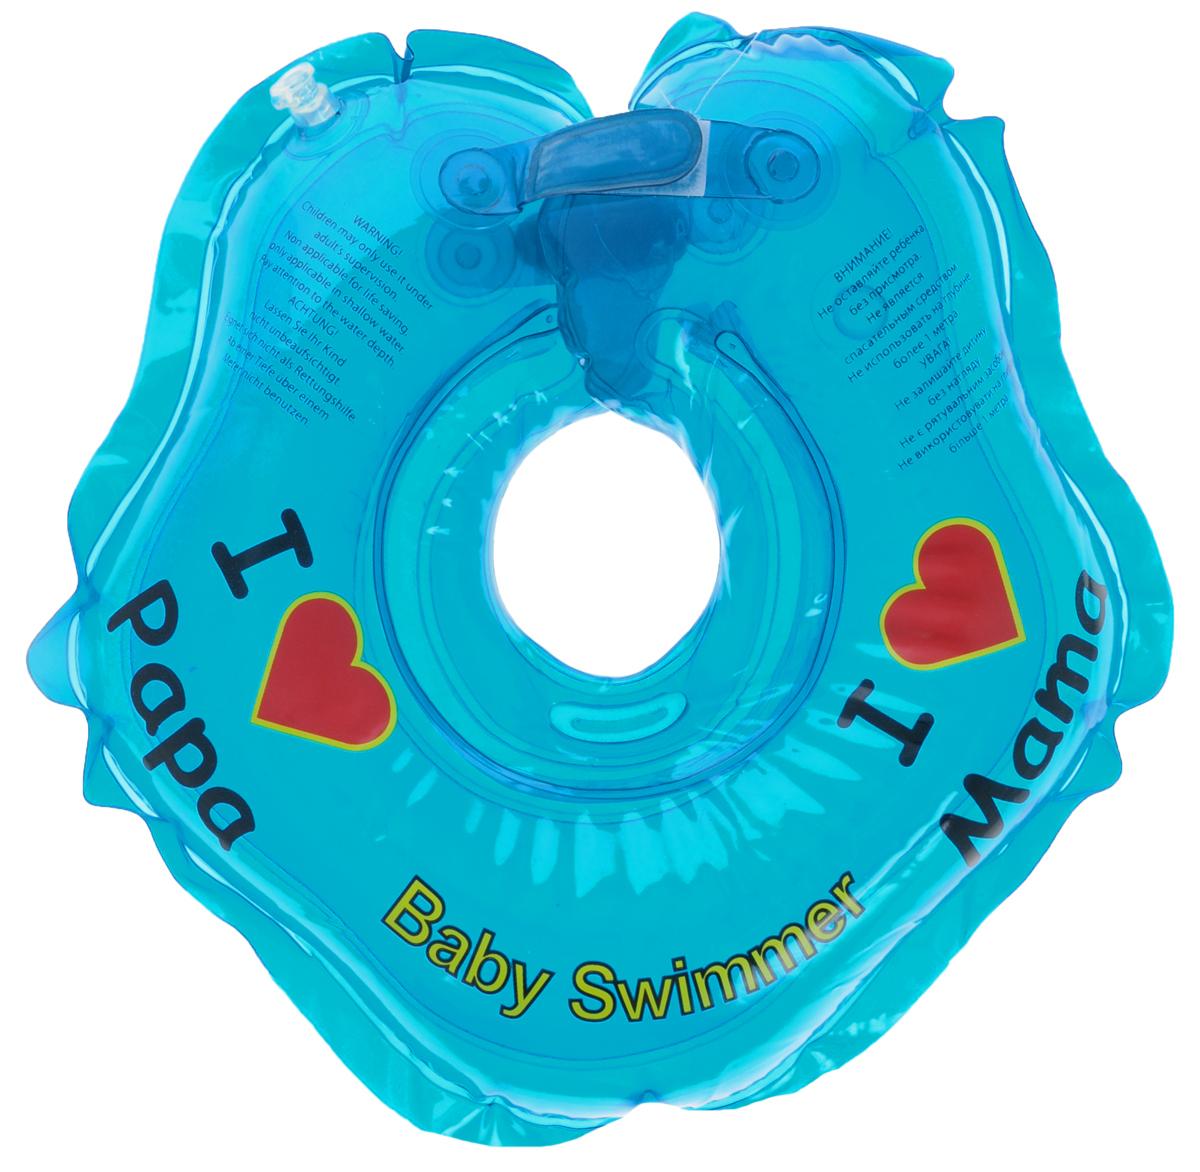 Baby Swimmer Круг на шею цвет голубой 3-12 кг -  Все для купания